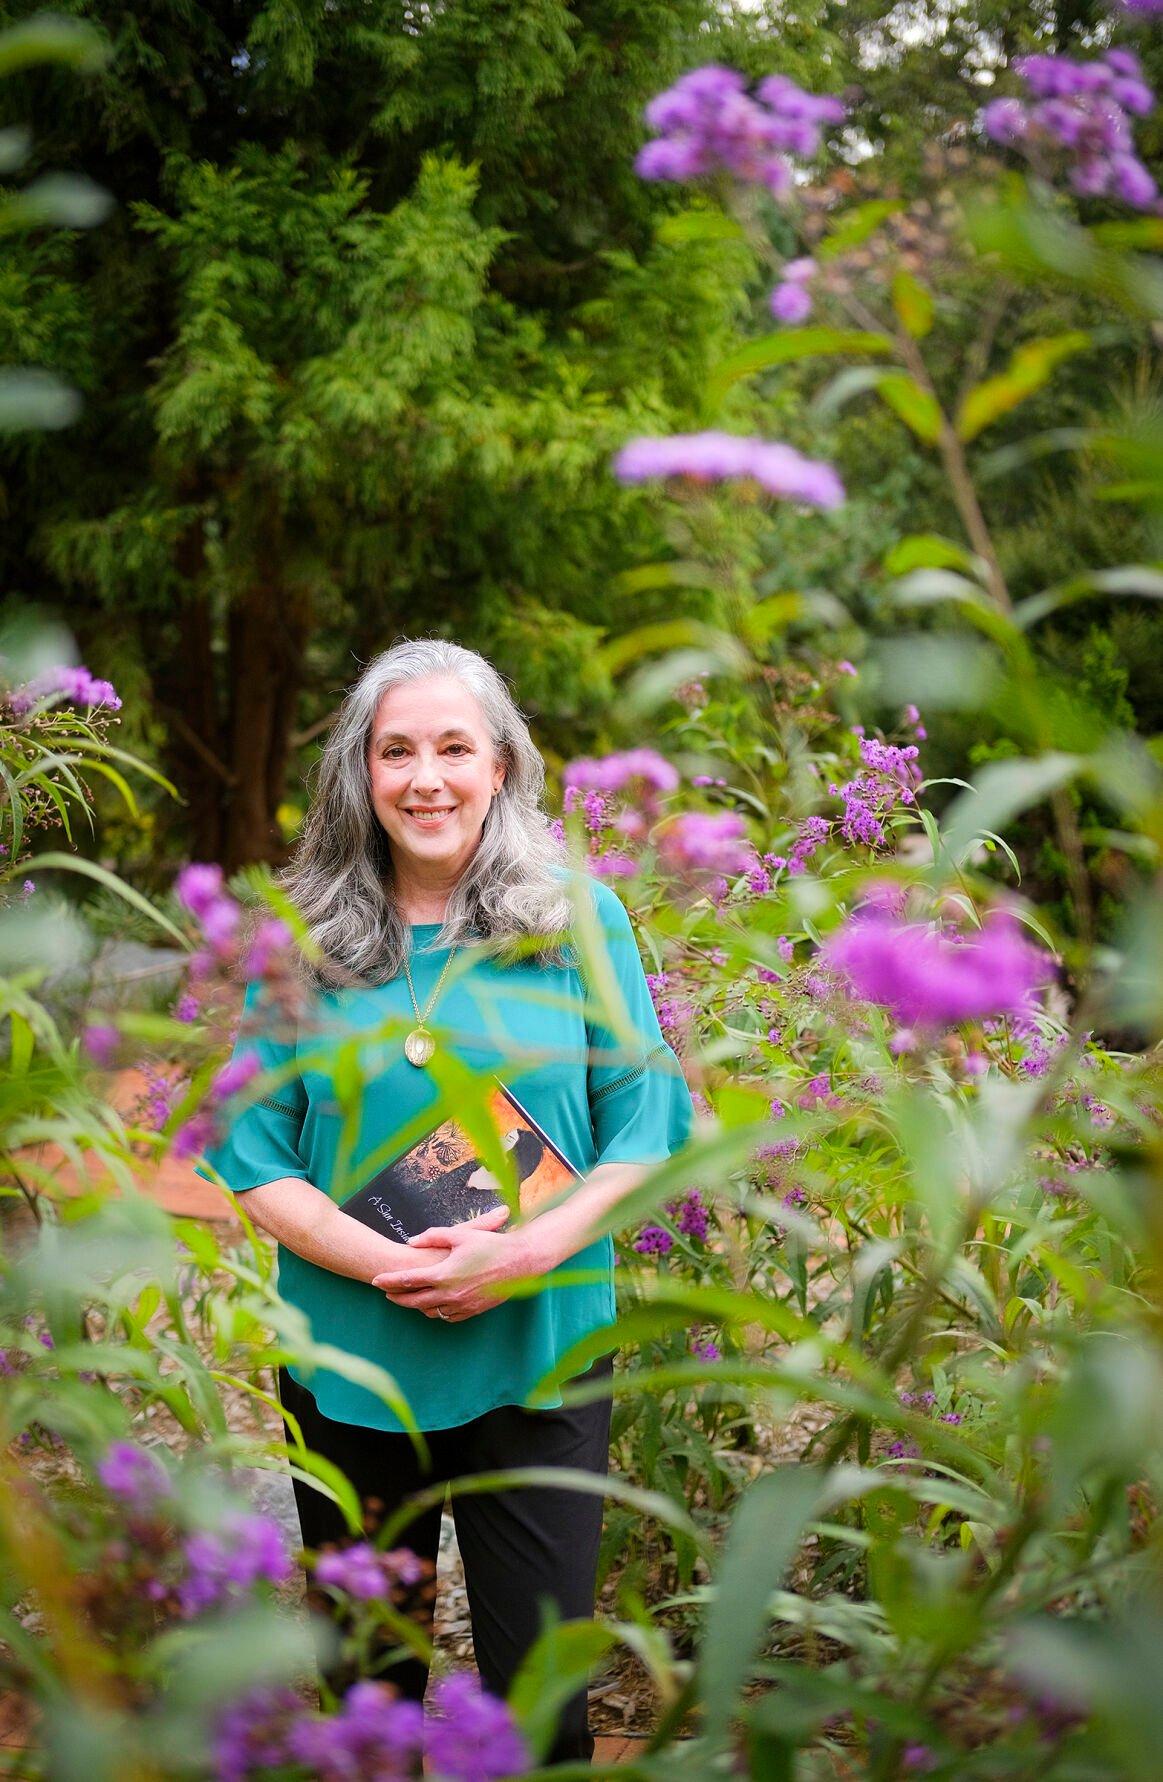 Poet Terri Kirby Erickson